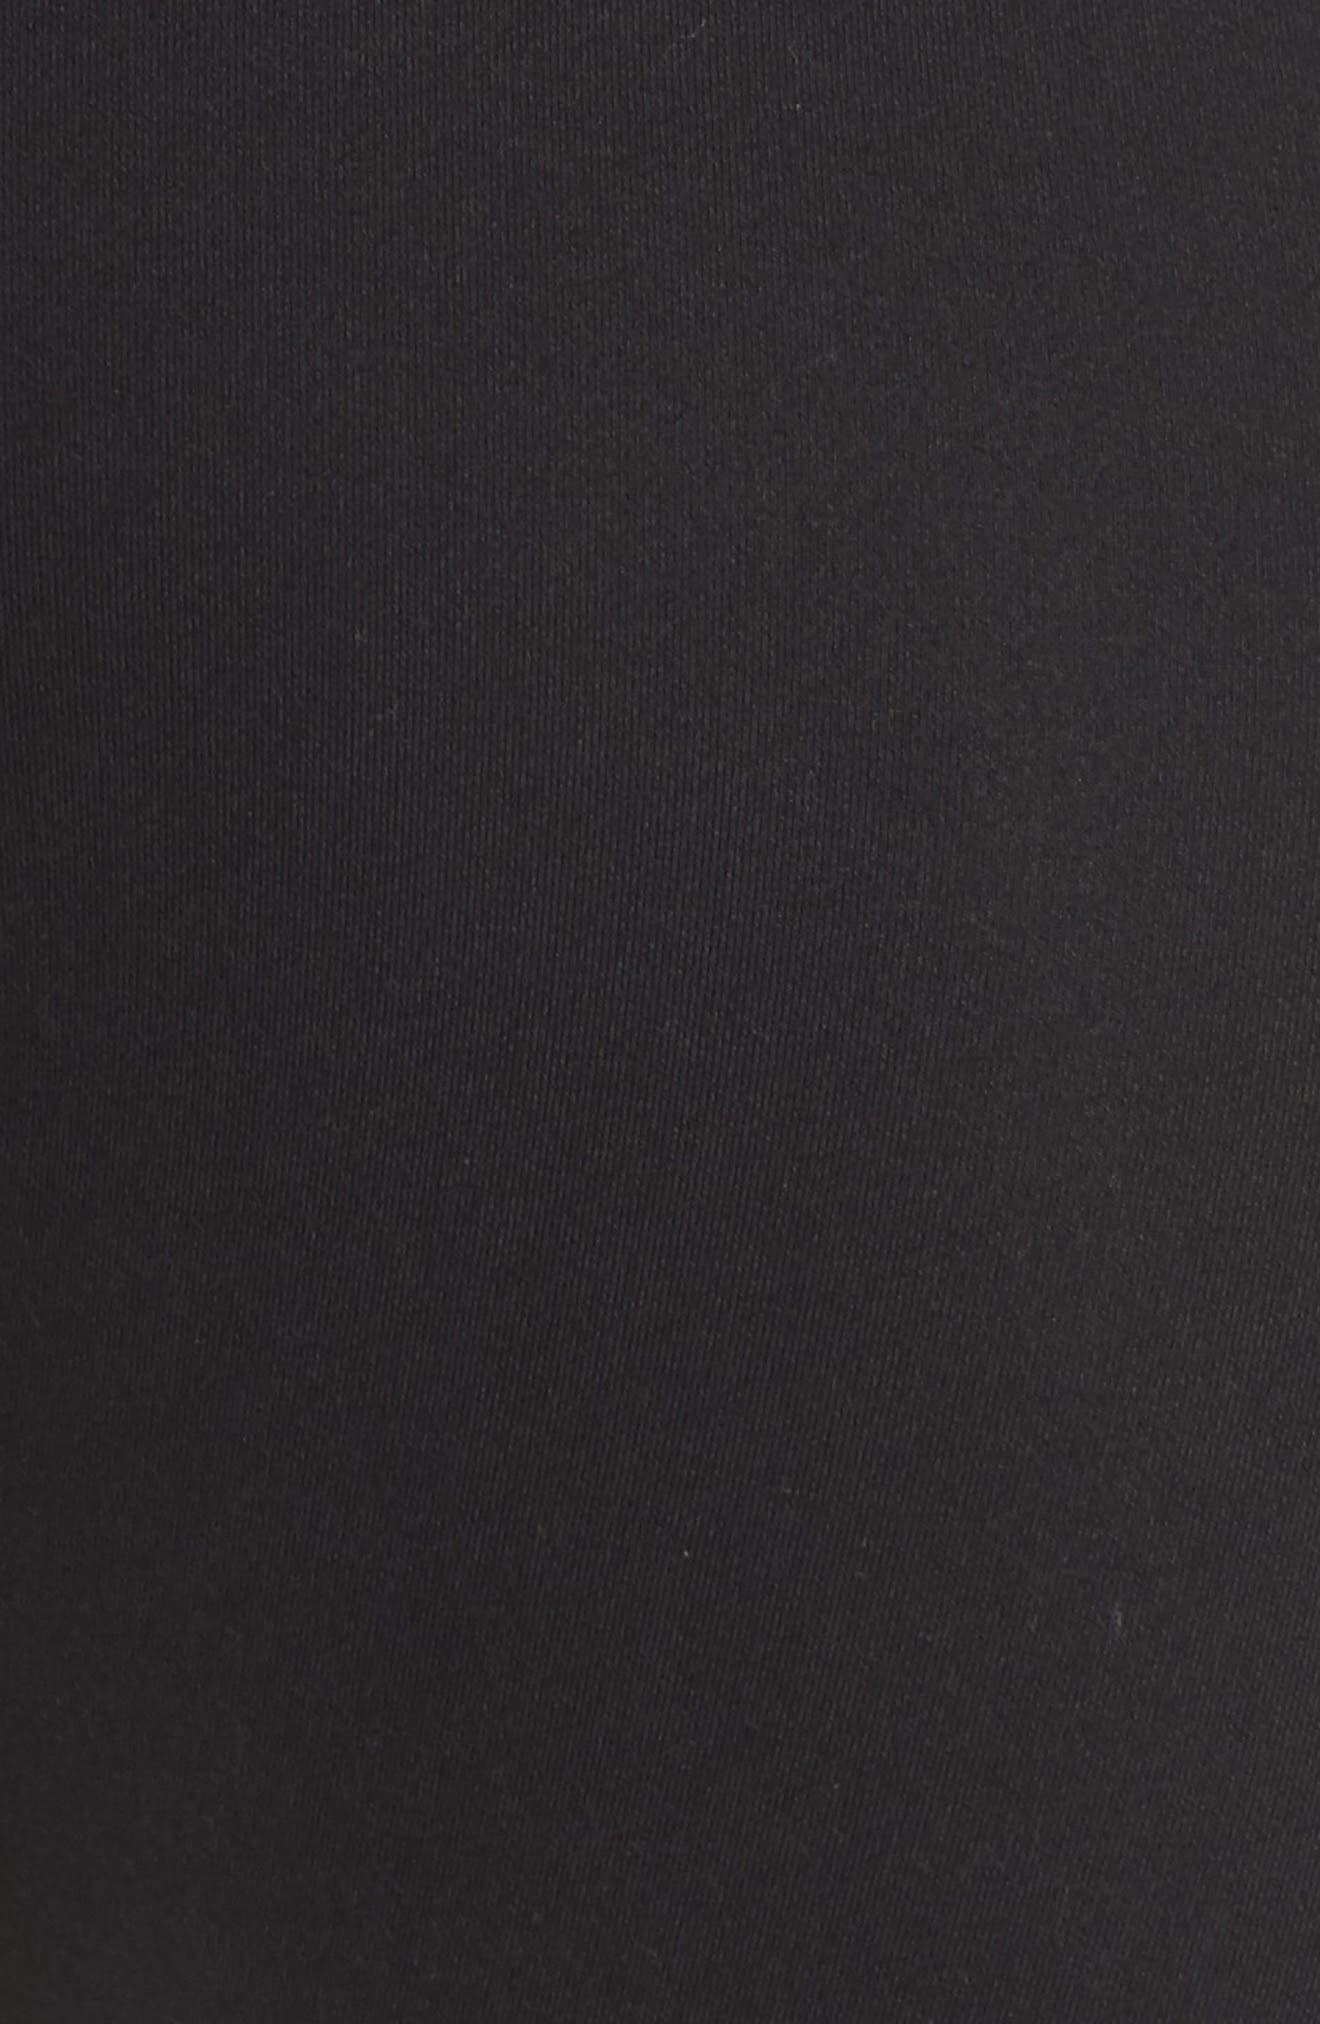 Evie Capri Leggings,                             Alternate thumbnail 6, color,                             BLACK